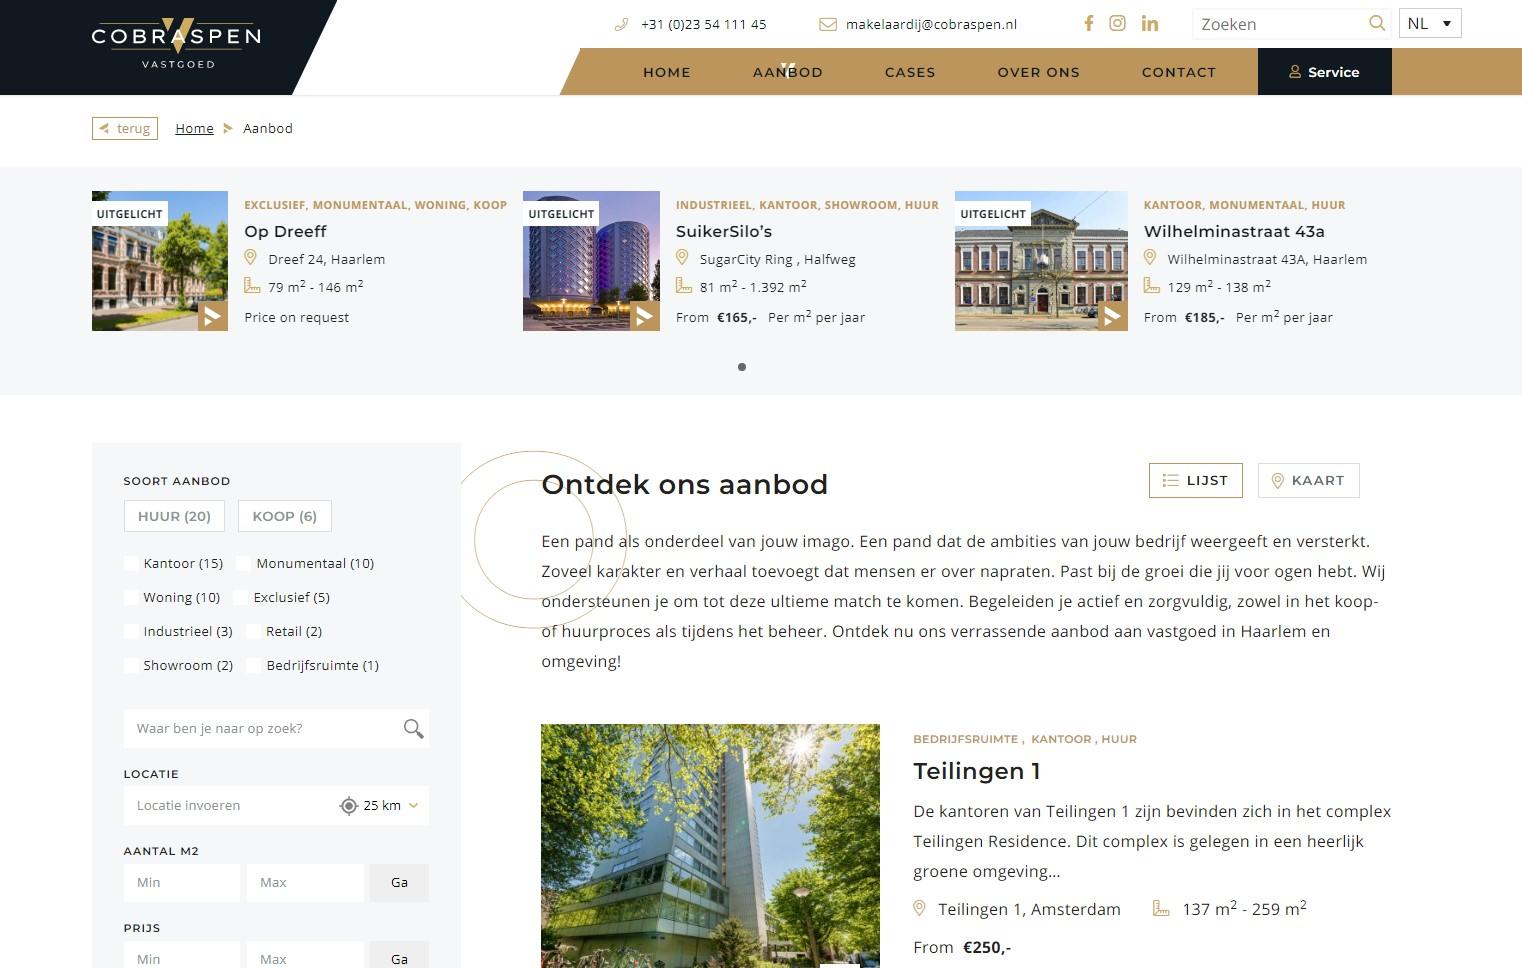 Aanbodpagina Cobraspenvastgoed.nl